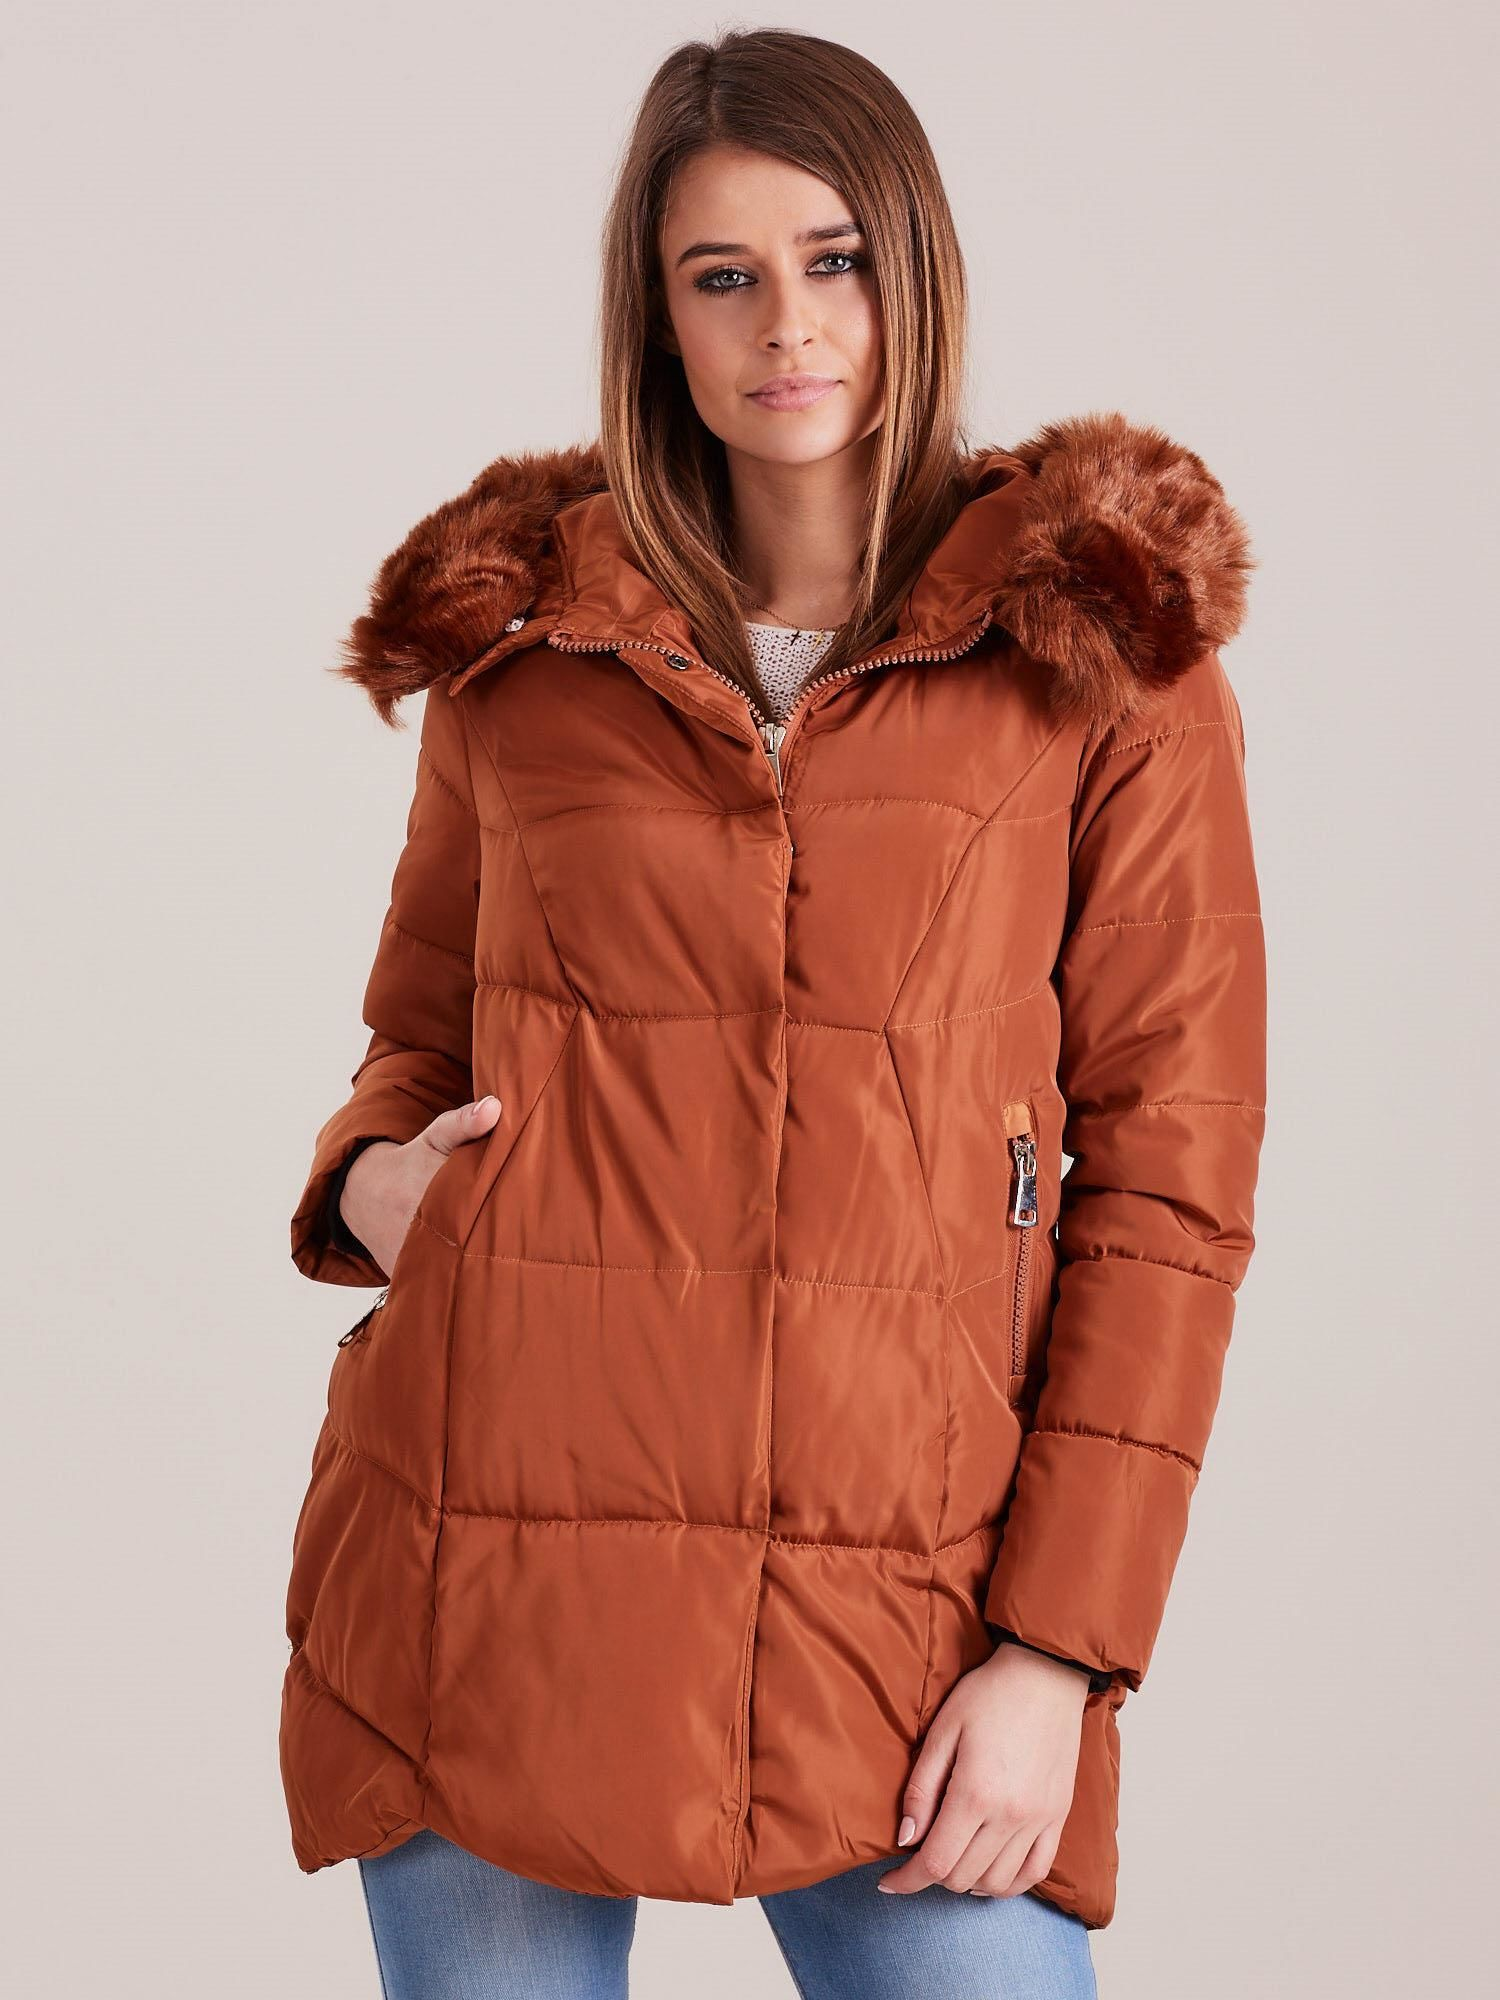 Hnedá zimná bunda s kapucňou - XL